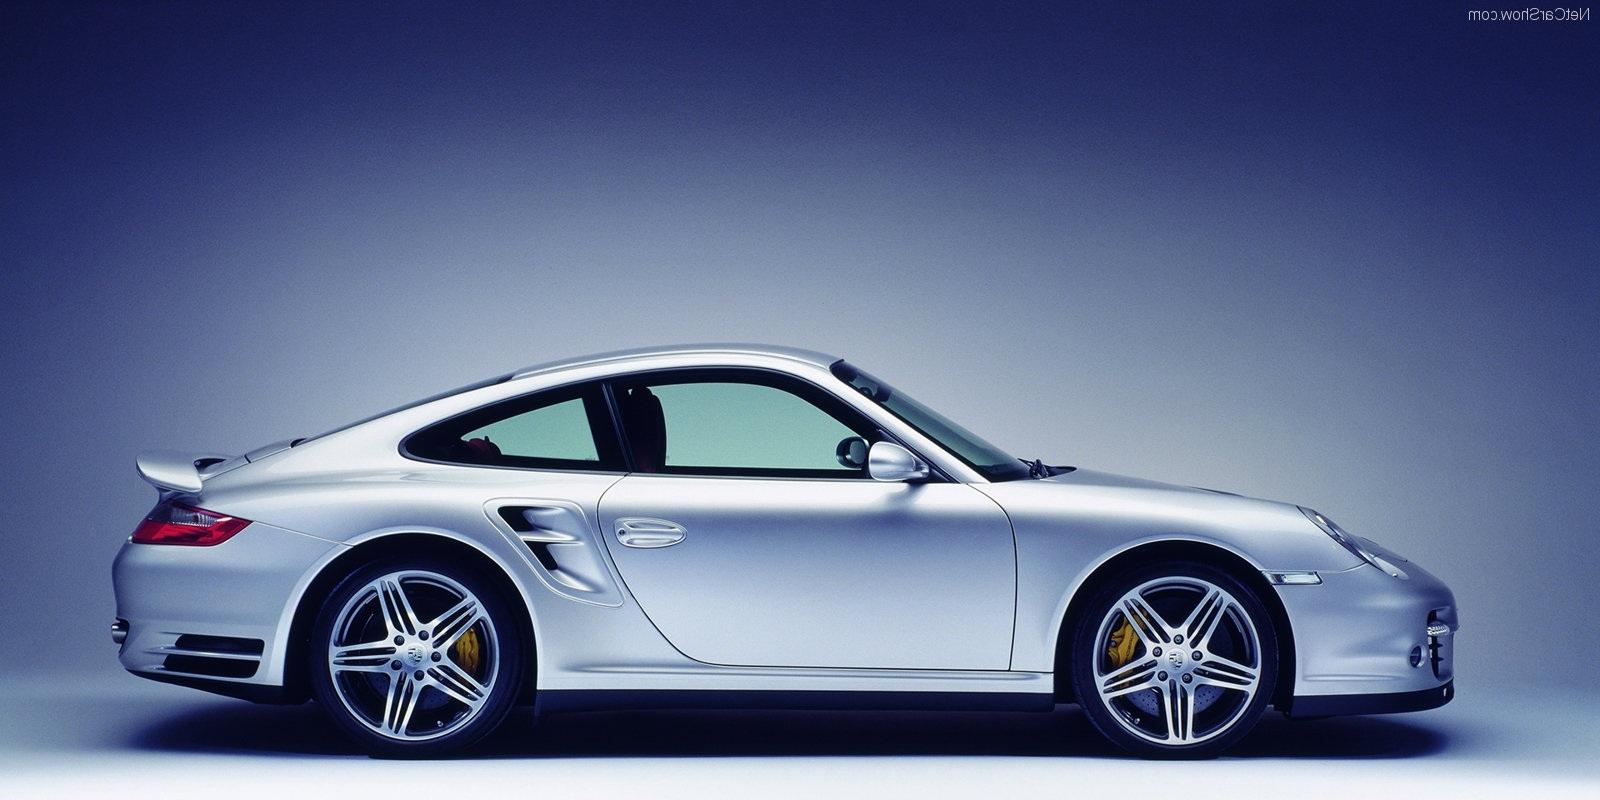 Used 2013 Porsche 911 Pricing Edmunds Autos Post